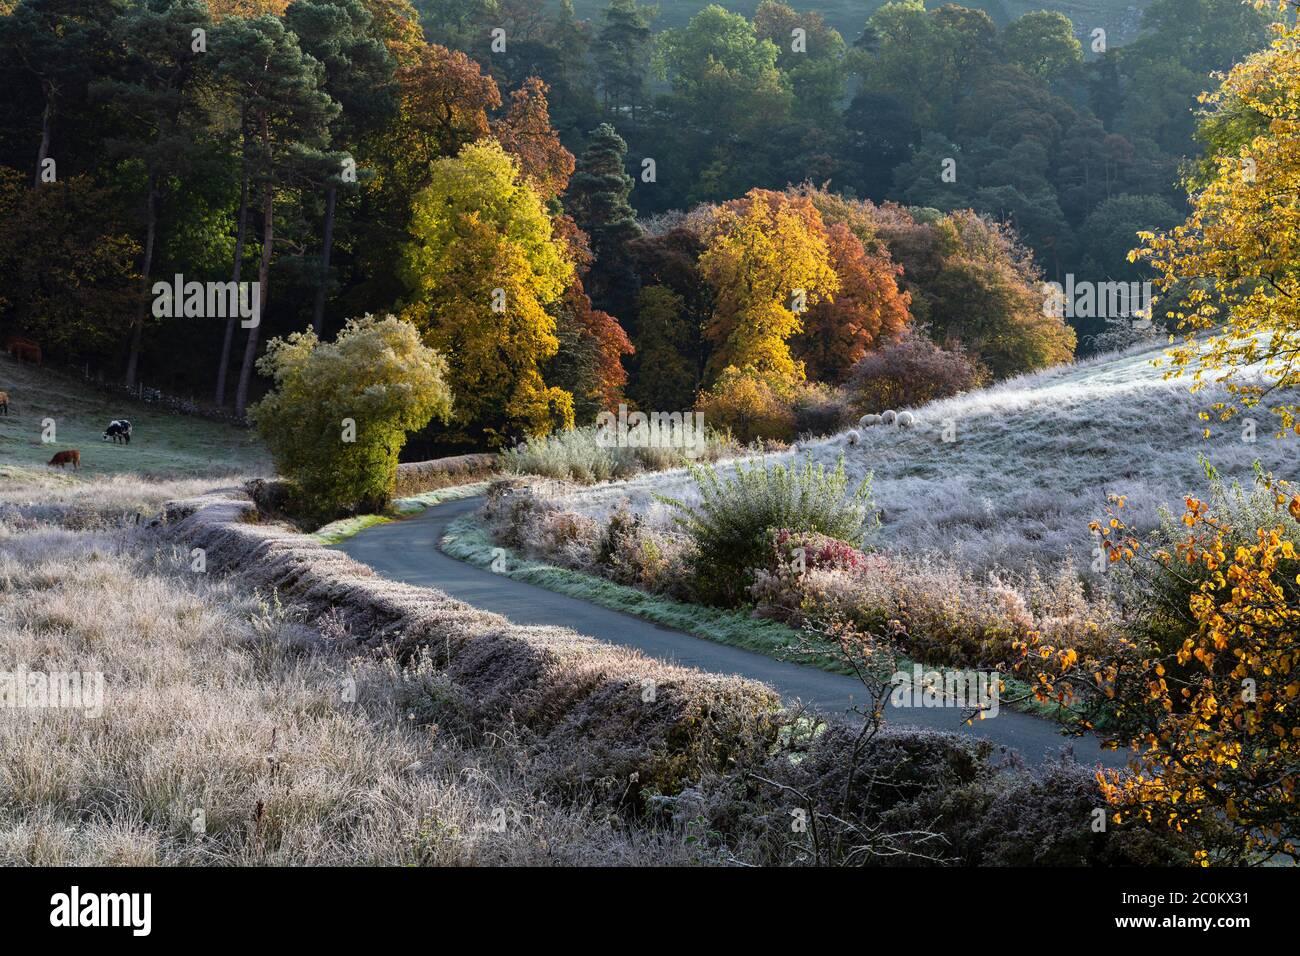 Una mañana de otoño helada en Beresford Dale, Dove Valley, Peak District National Park, Staffordshire, Inglaterra Foto de stock